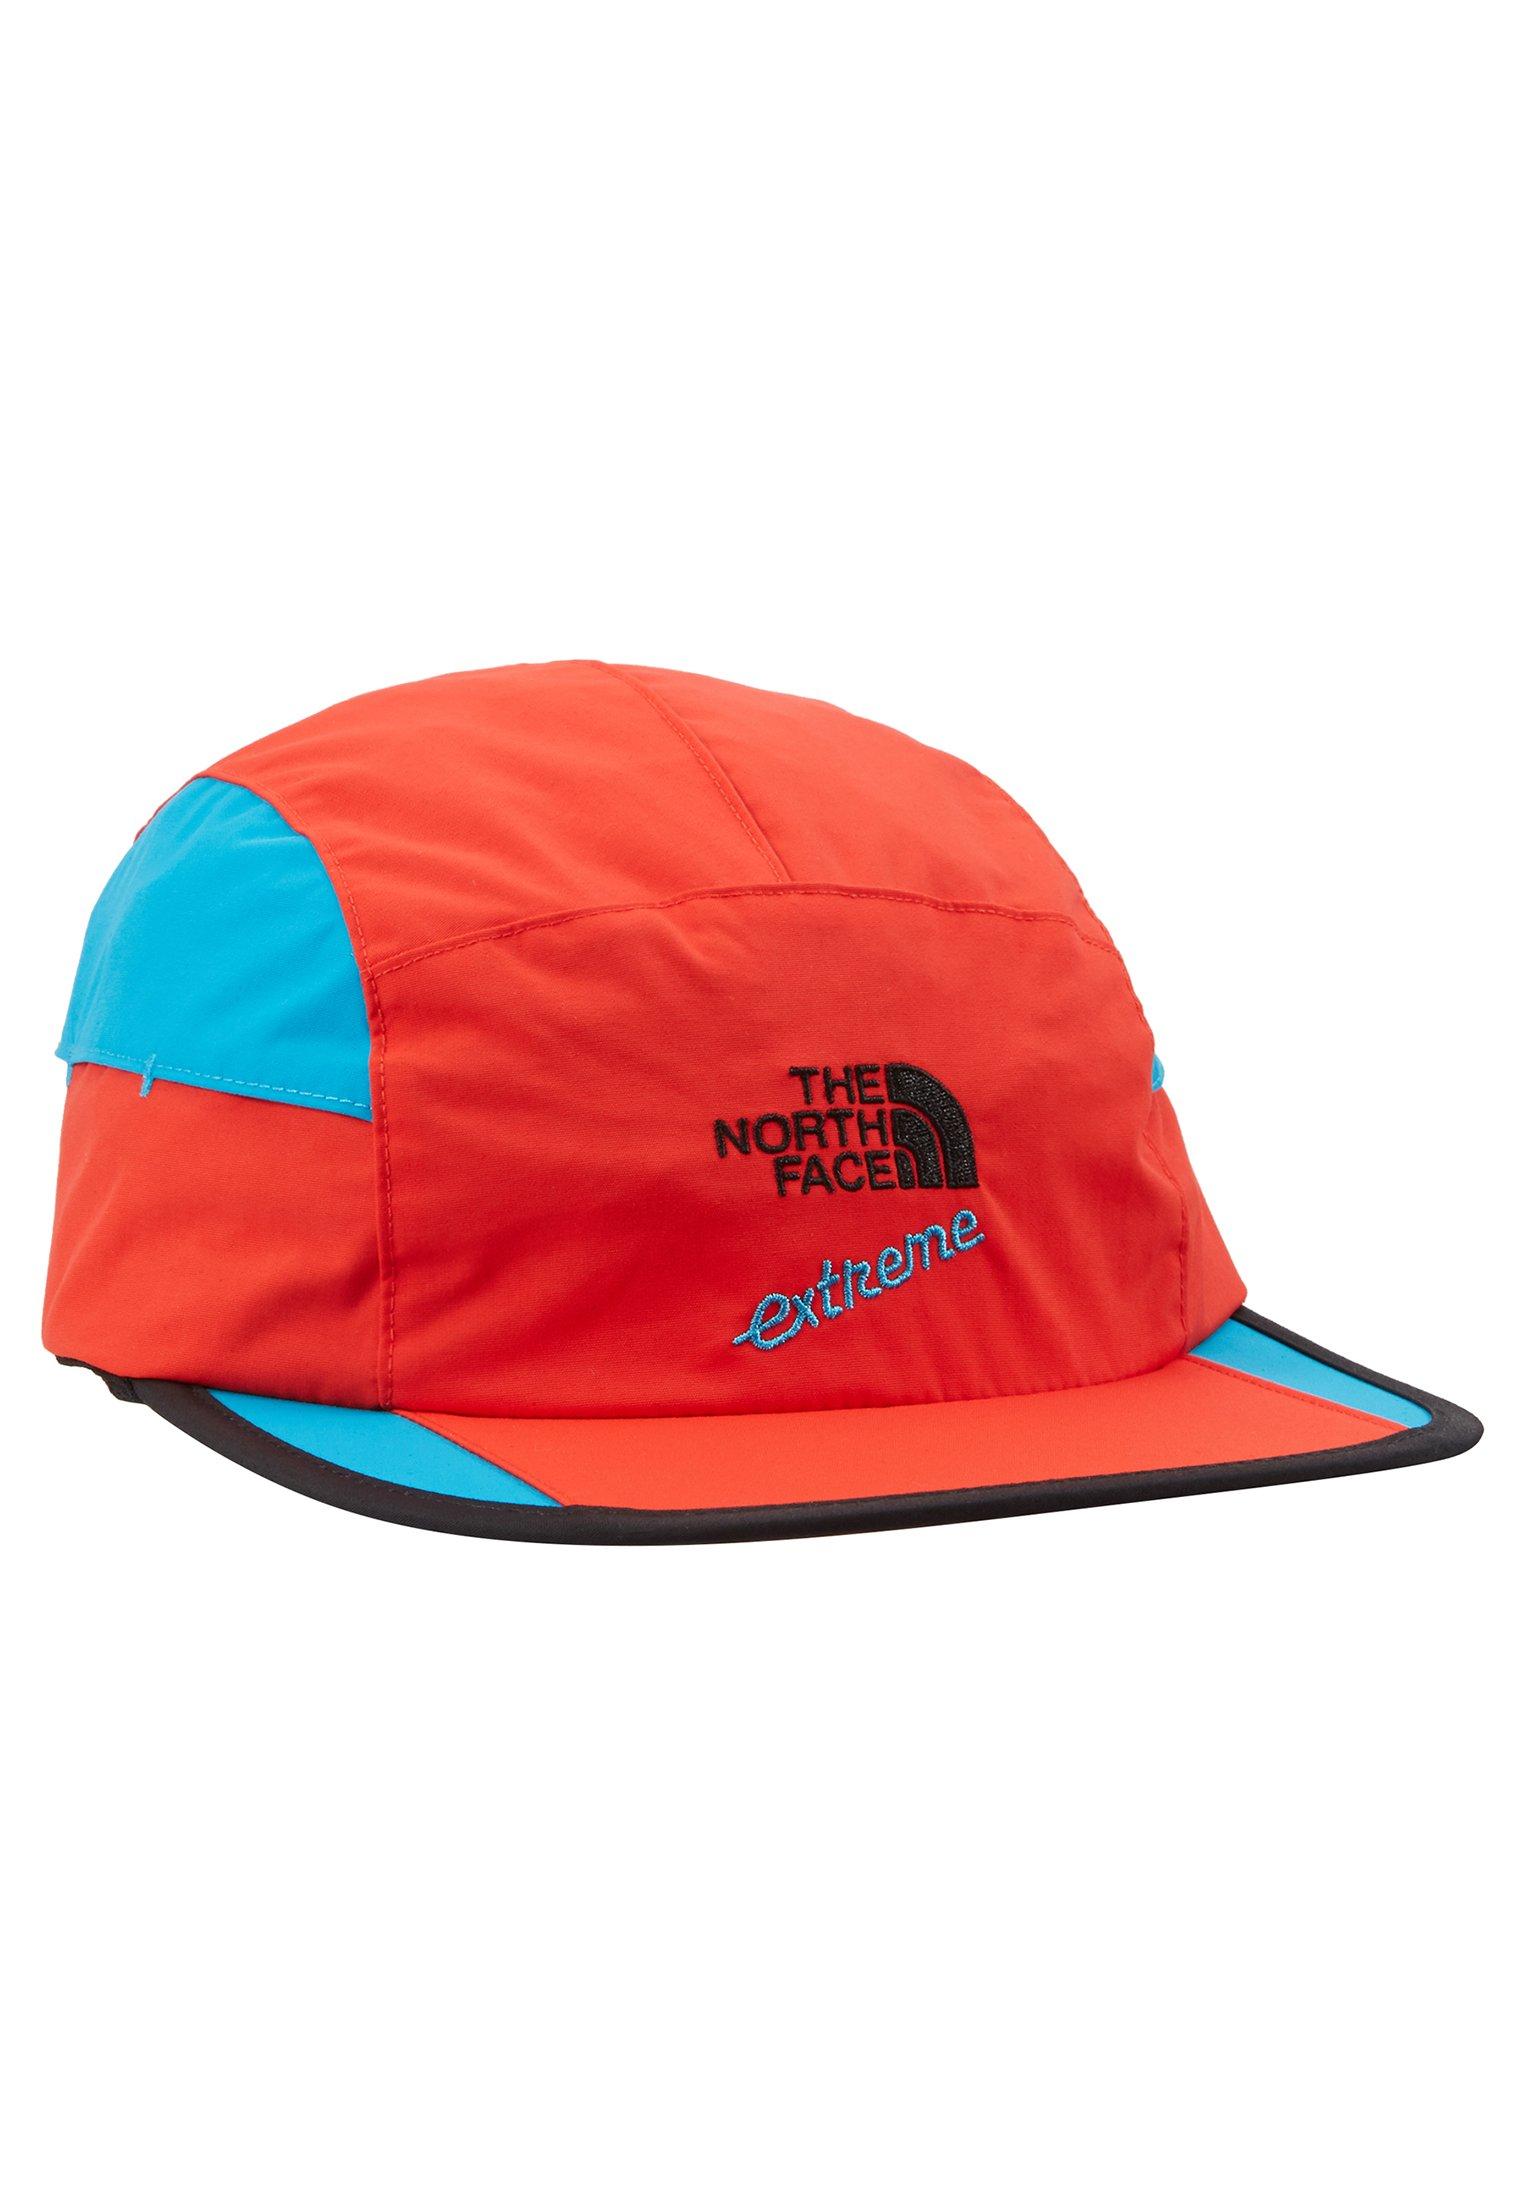 The North Face Extreme Ball - Cap Asphalt Grey/dunkelgrau